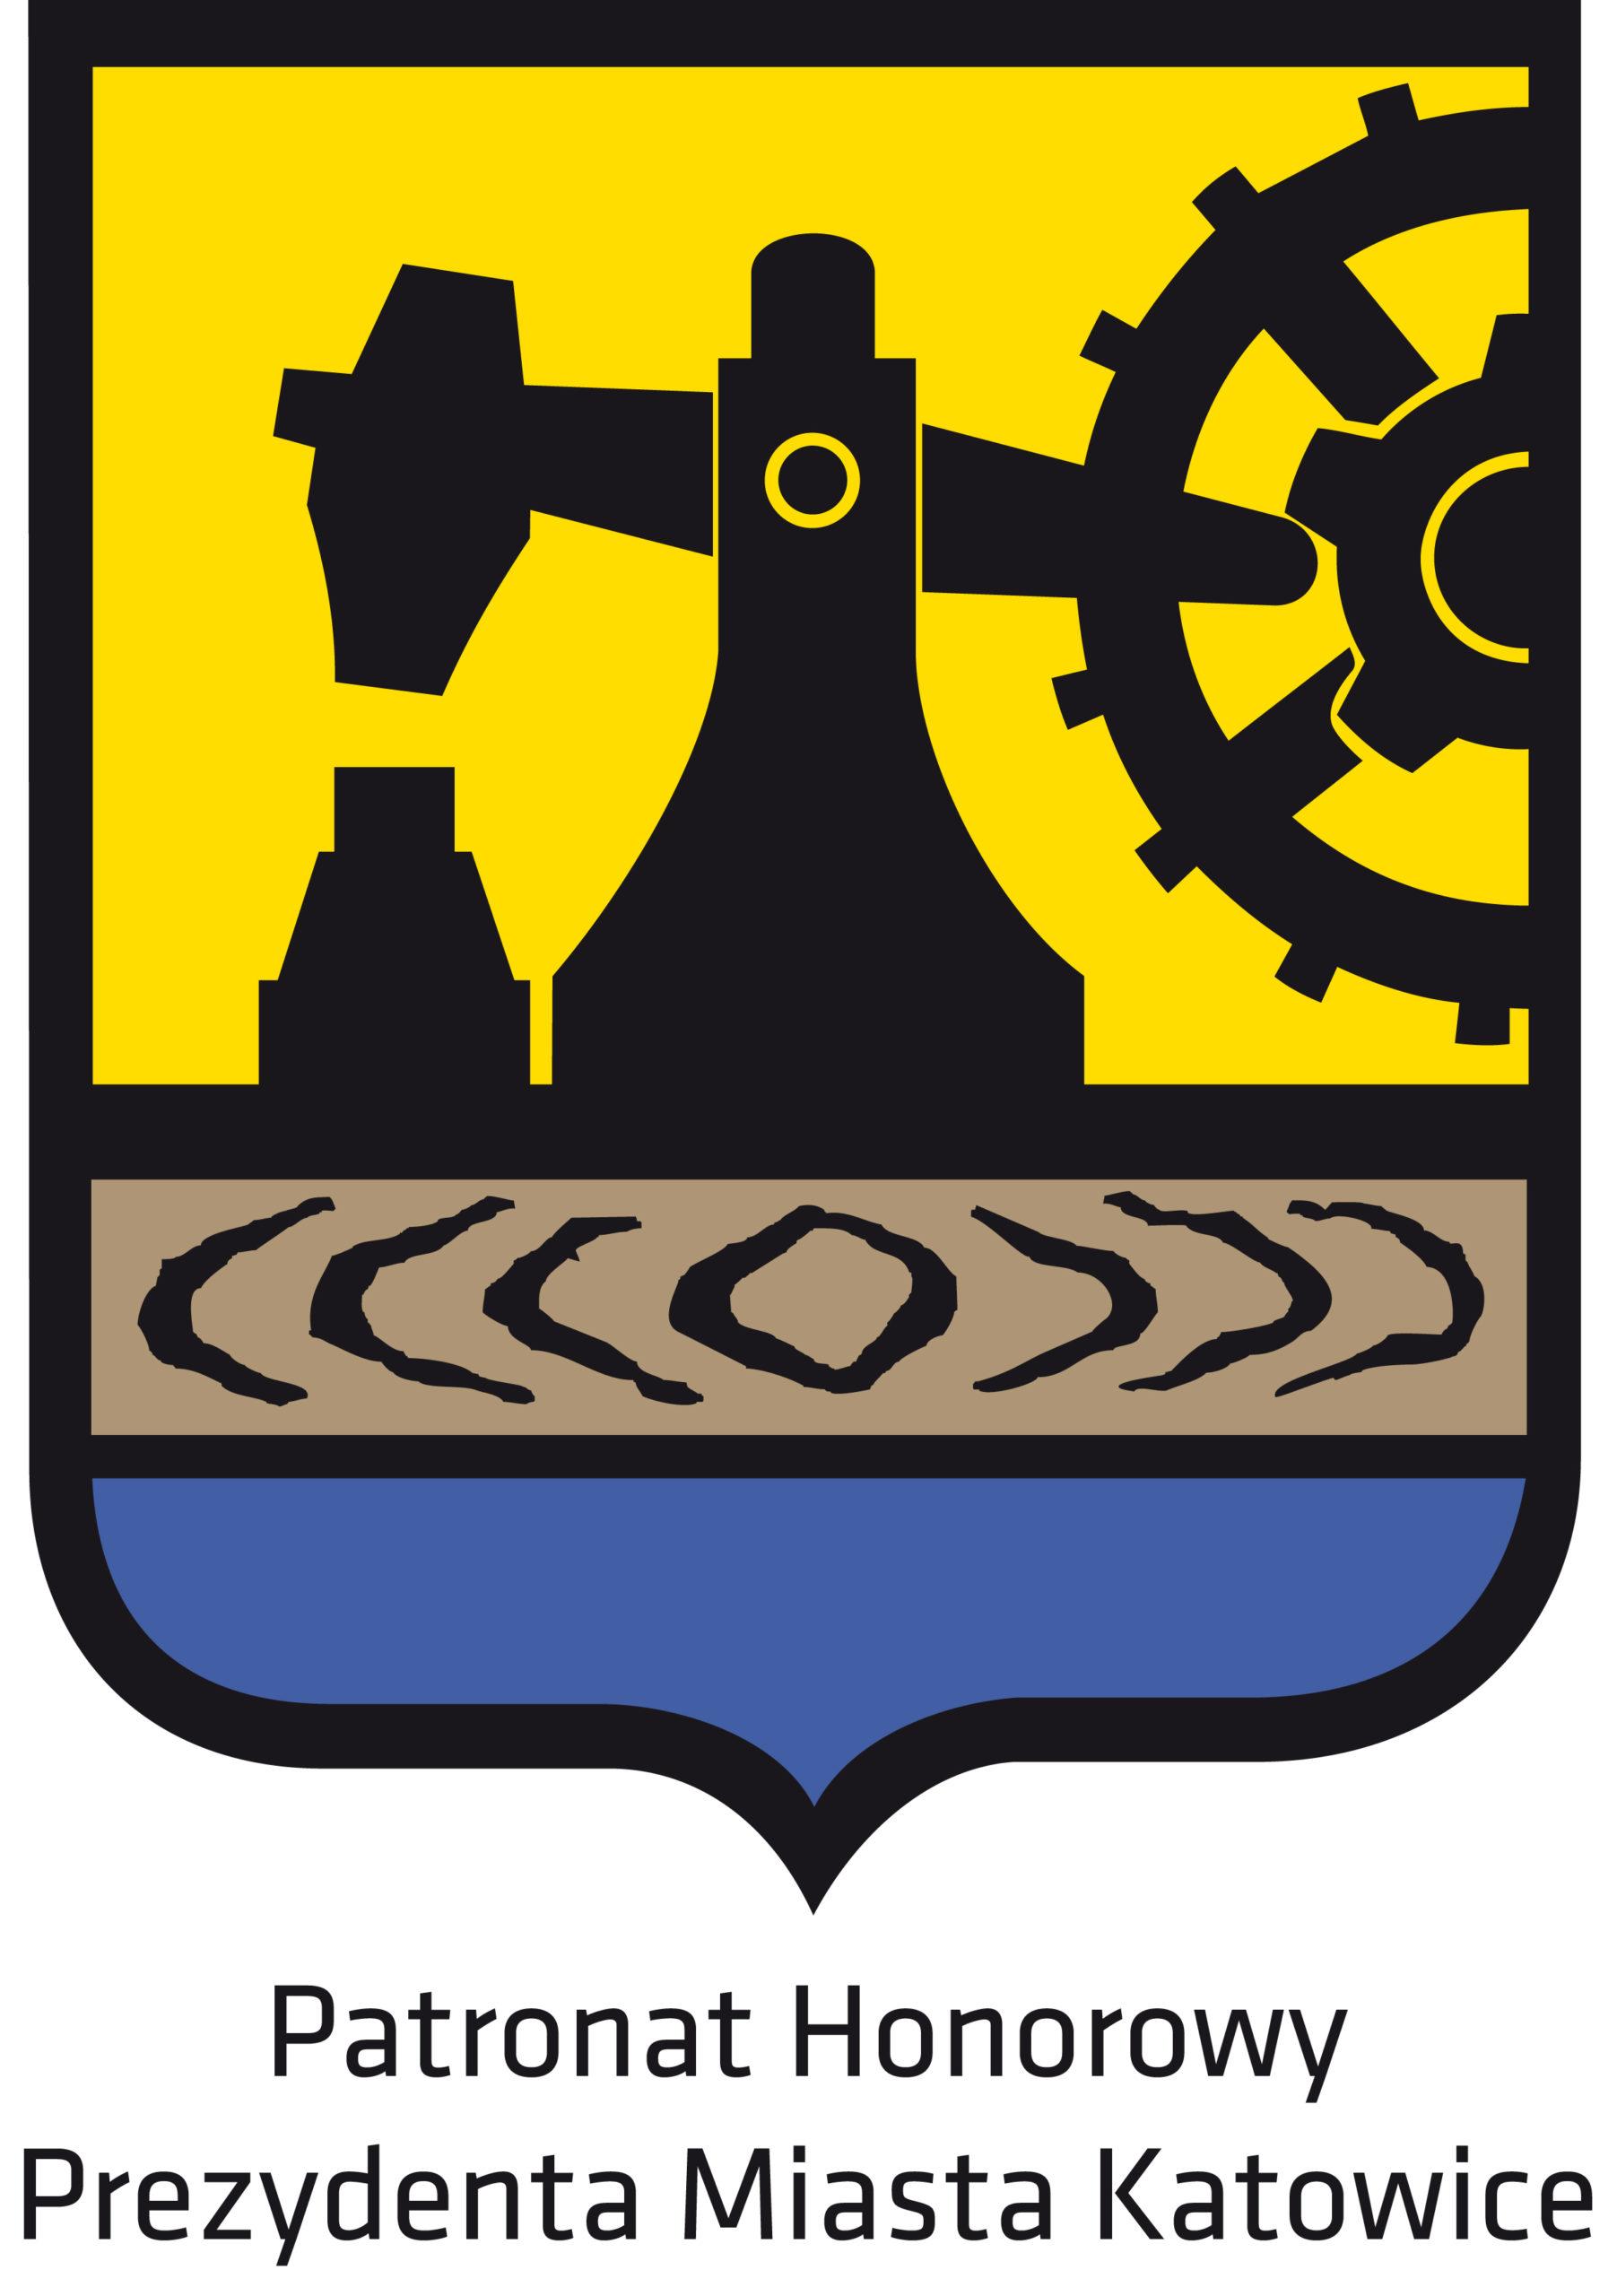 Patronat Honorowz Prezydenta Miasta Katowice